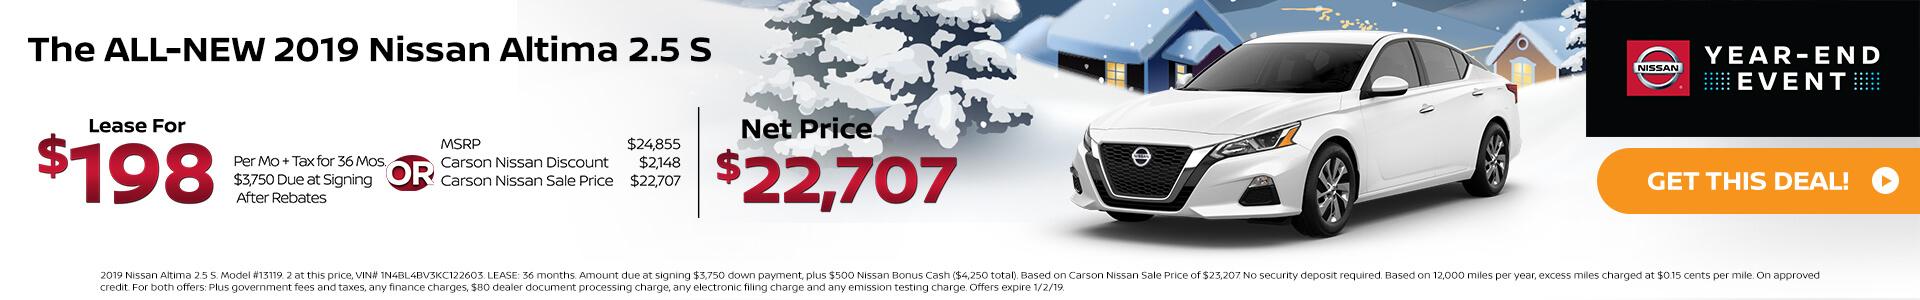 2019 Nissan Altima 2.5